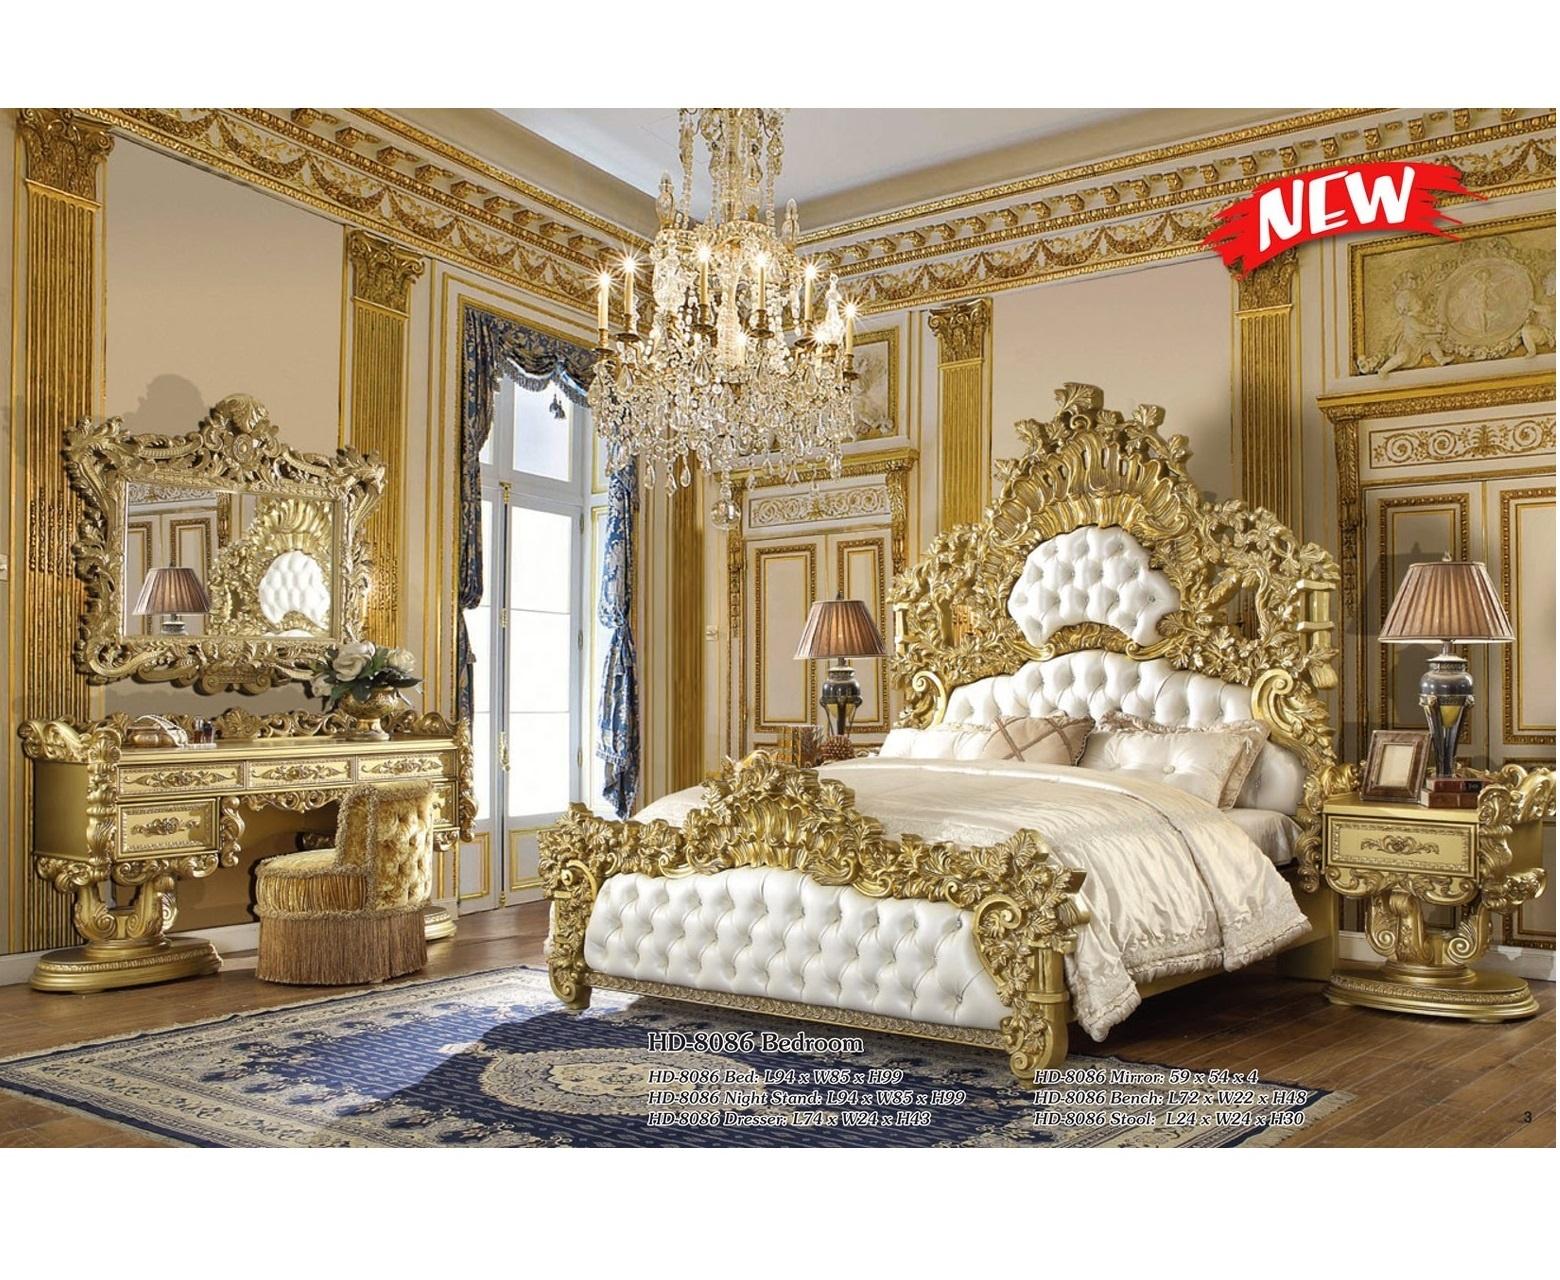 Victorian European Bedroom Buy Victorian Bedroom Set Antique Victorian Bedroom Furniture European Style Bedroom Set Product On Alibaba Com